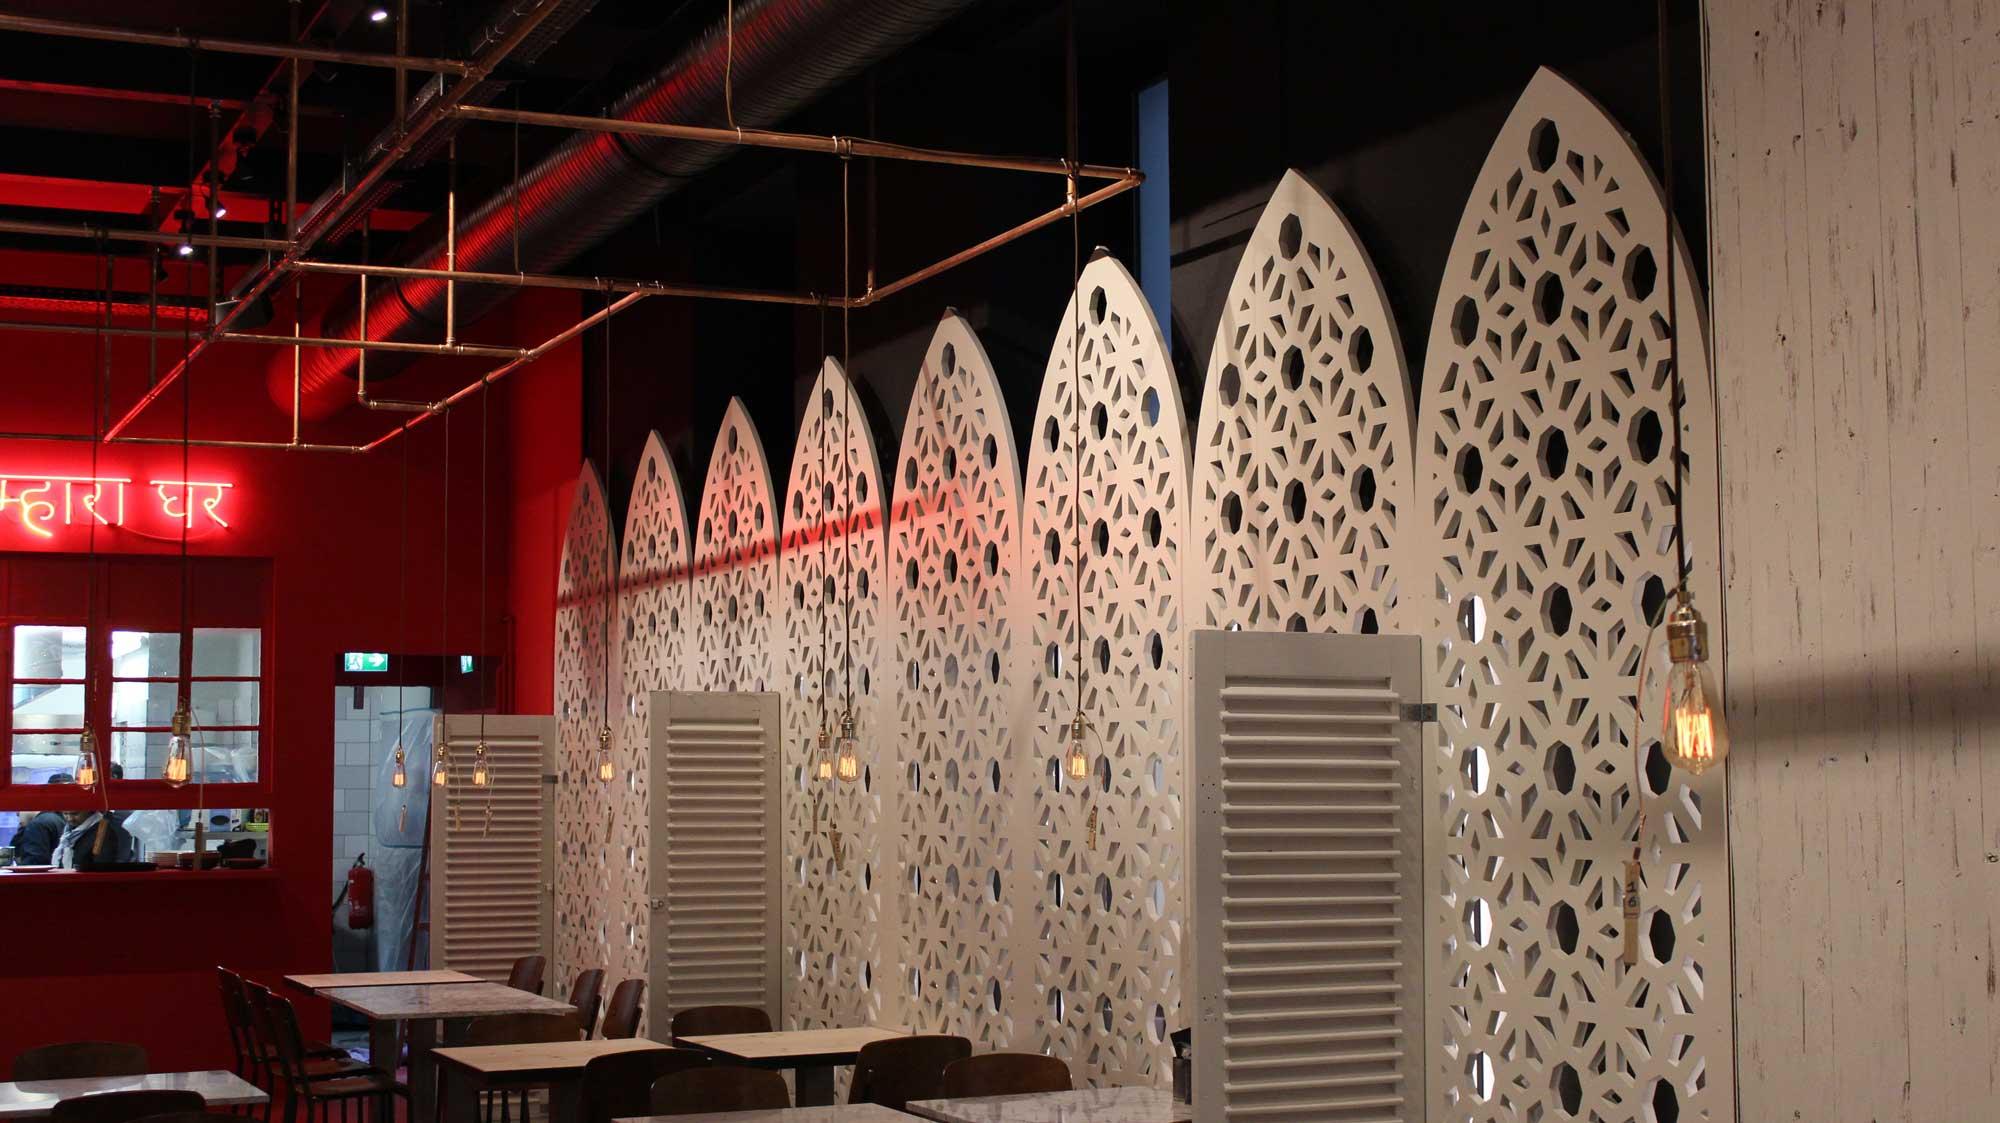 Restaurant-eat-dori---Trennwand-Impressionen-2